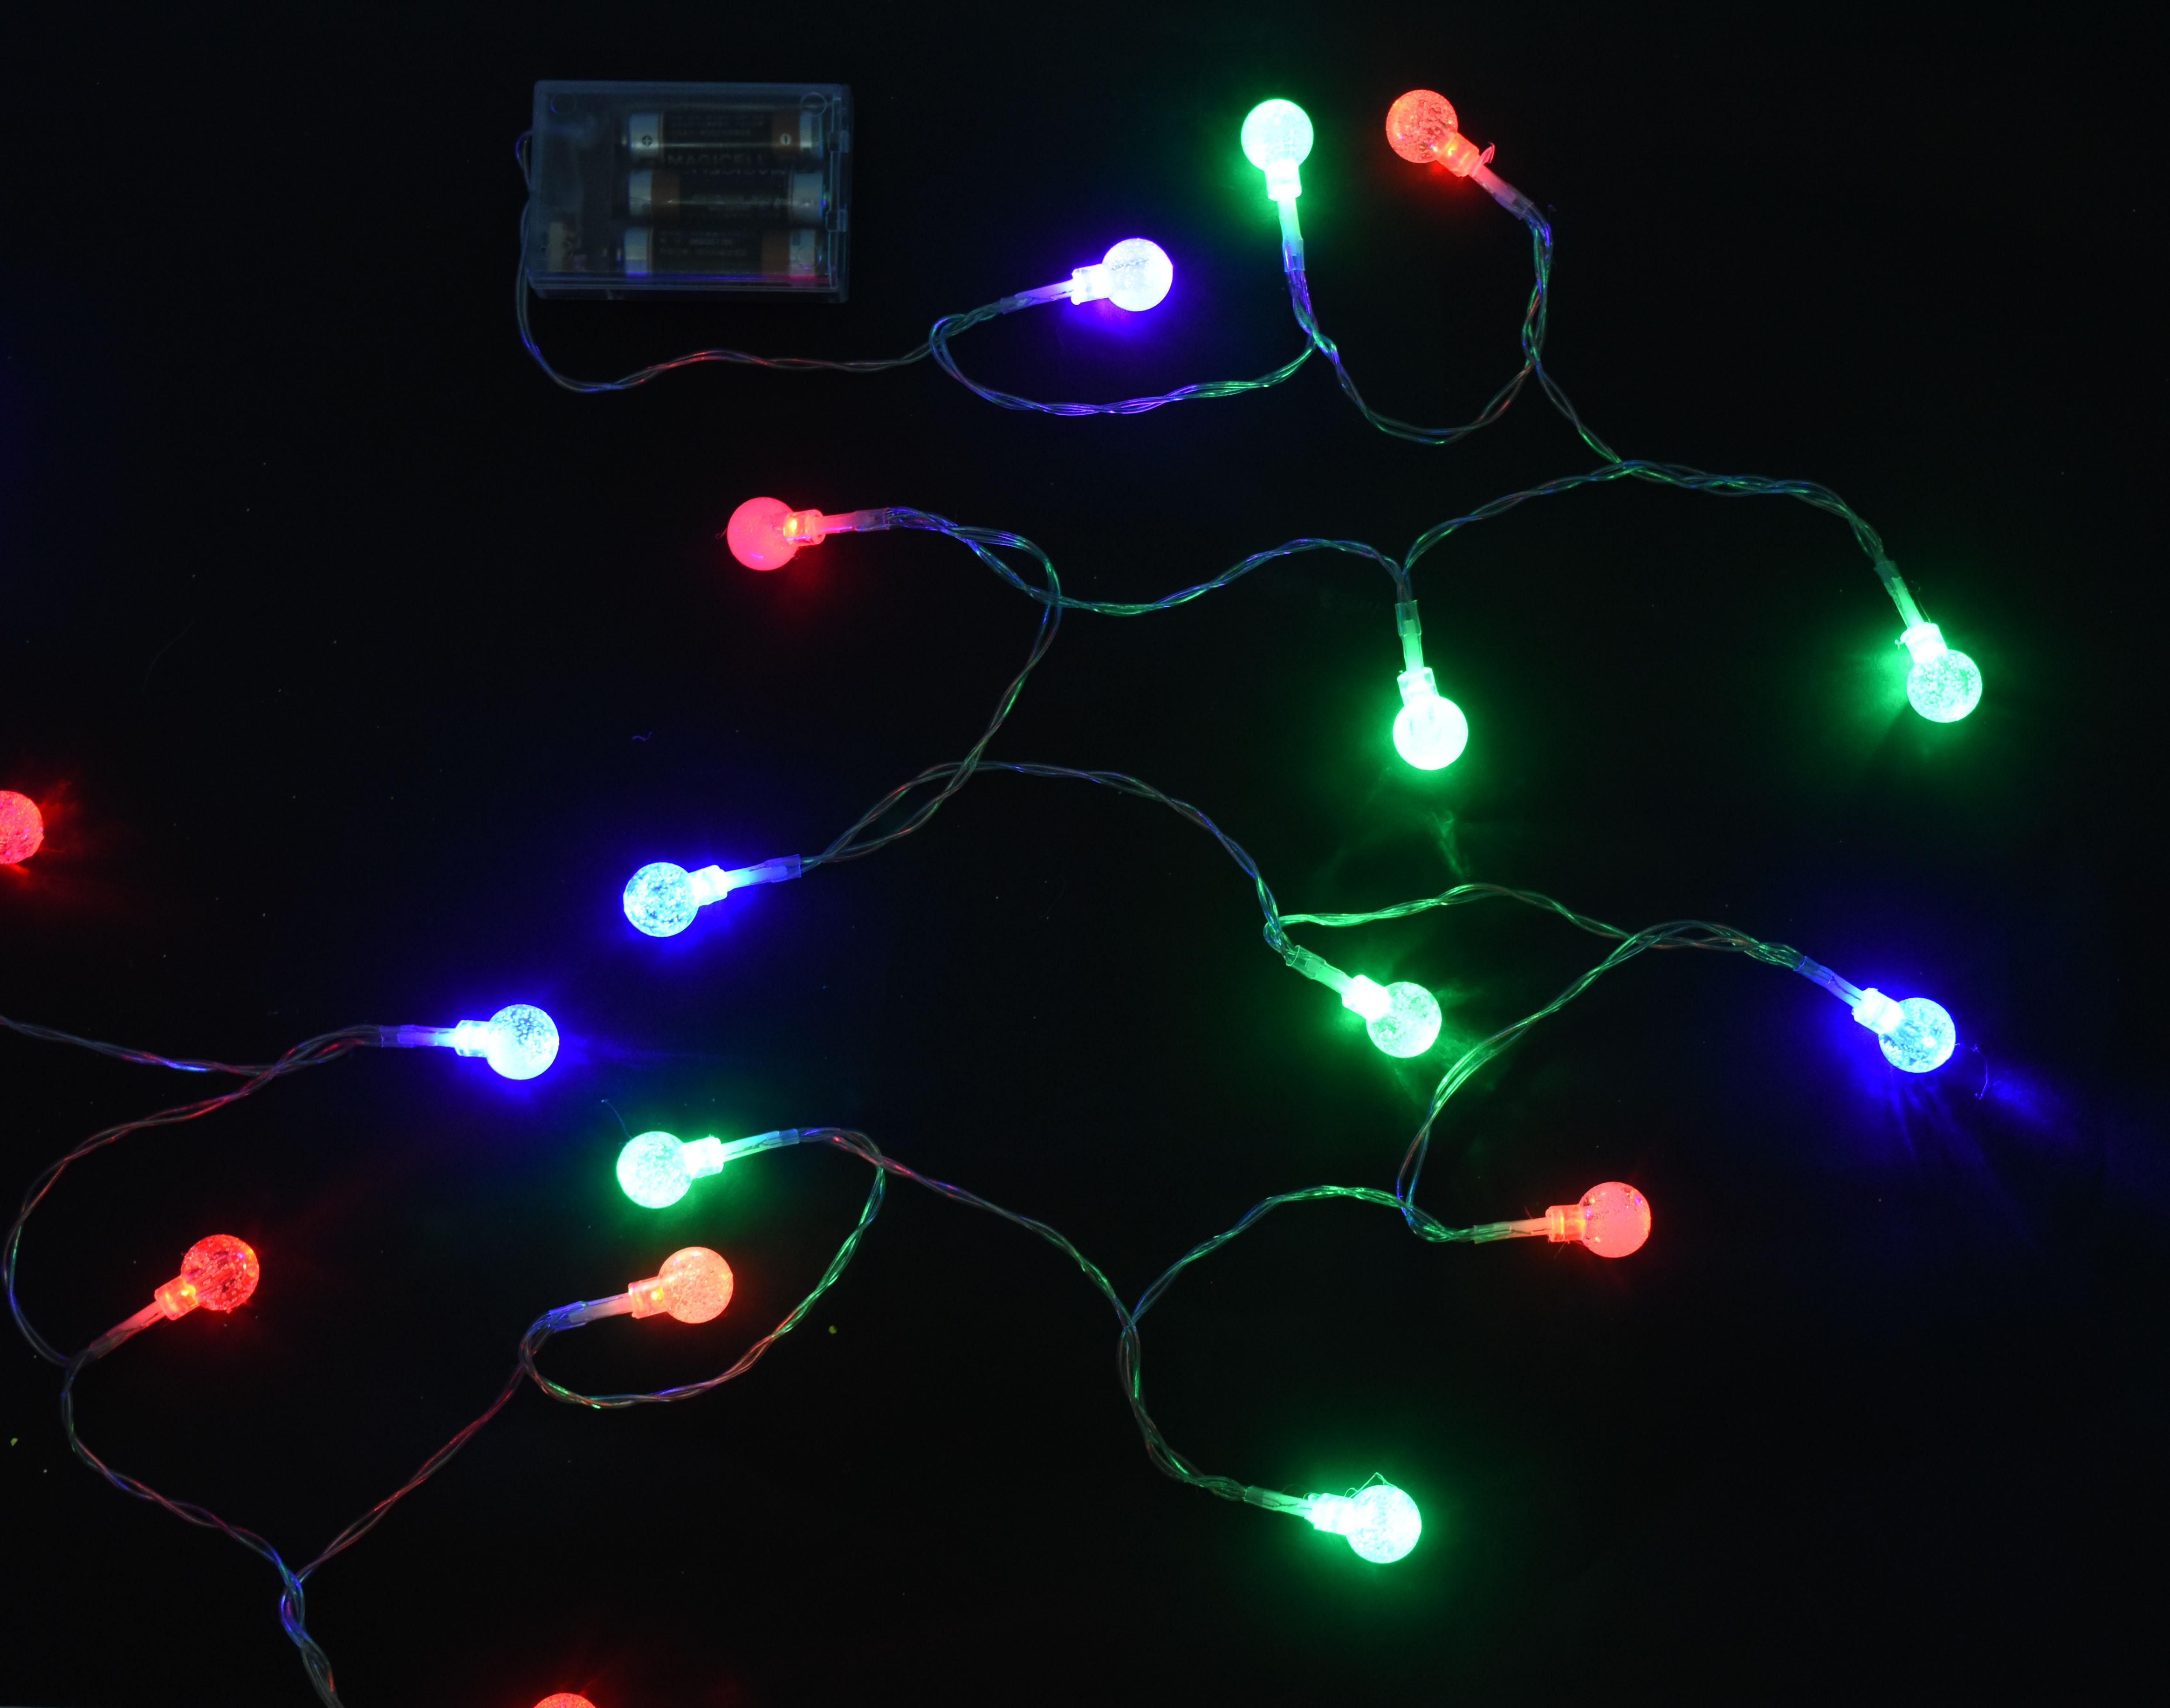 X射線【X411564】20燈LED水晶球電池燈(彩光),聖誕樹/LED/聖誕燈飾/造型燈/聖誕佈置/裝飾燈/聖誕樹